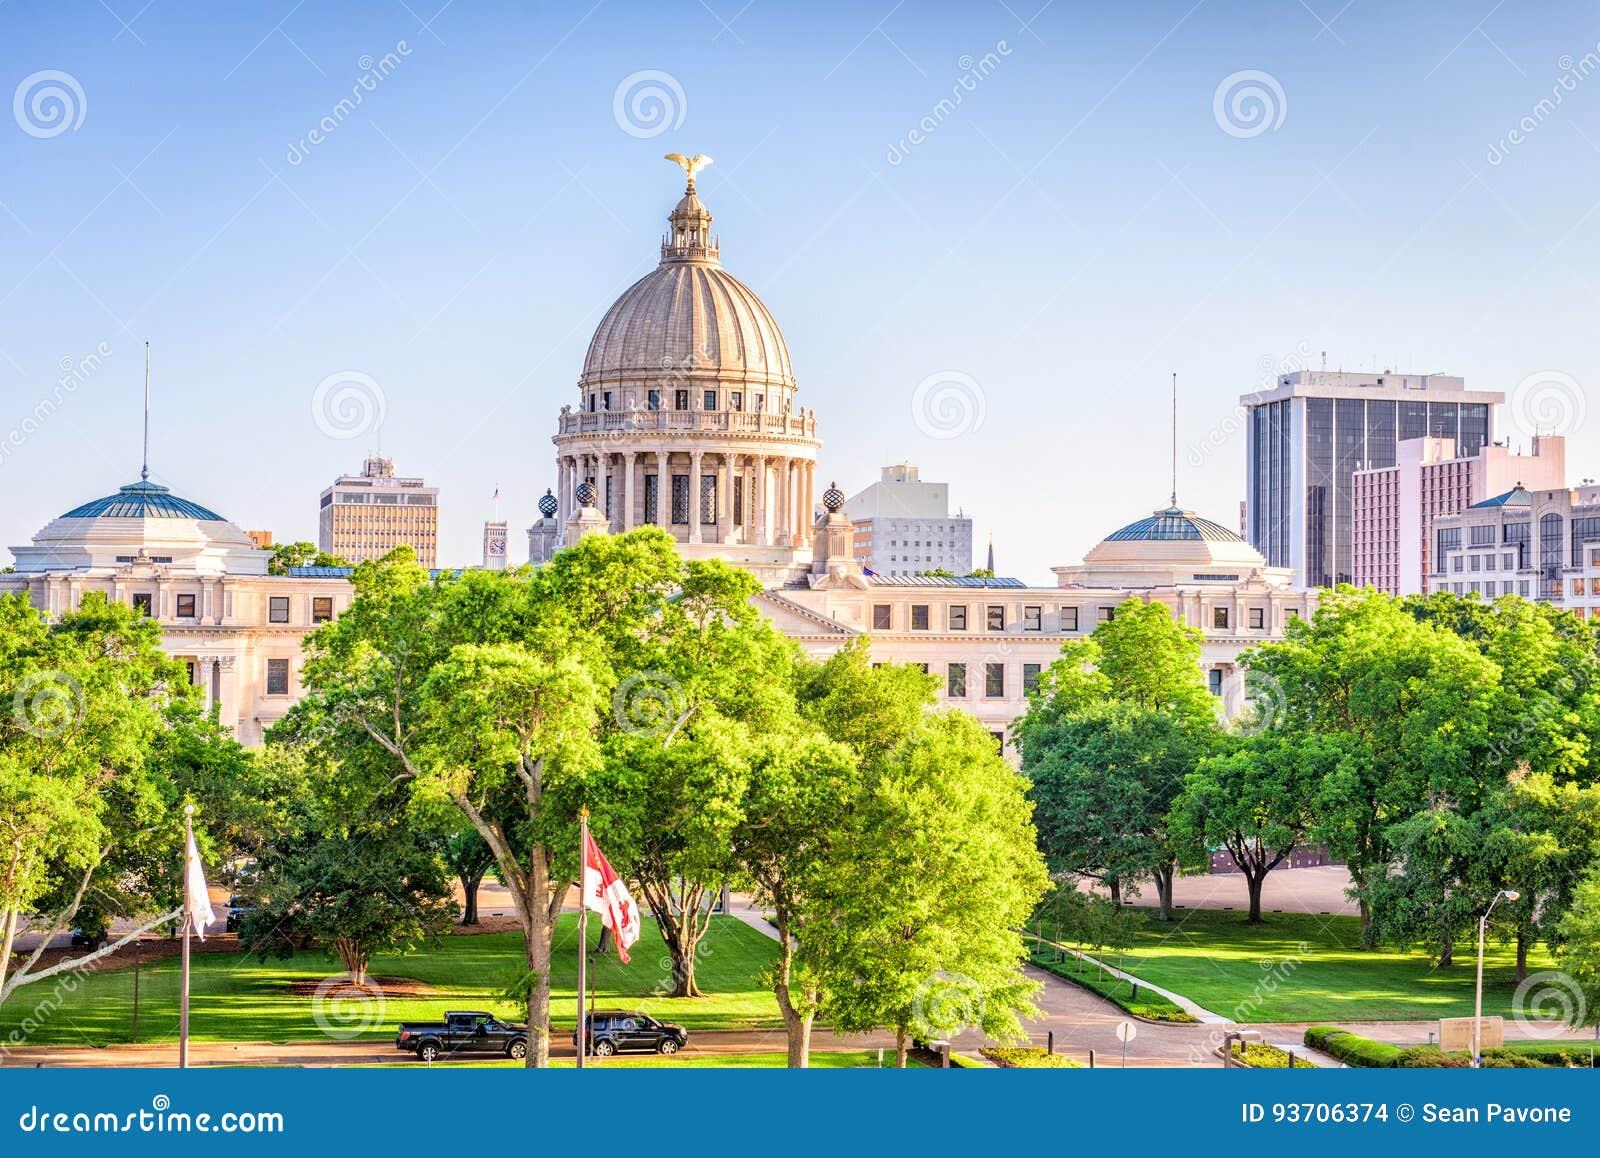 Jackson, Mississippi, USA